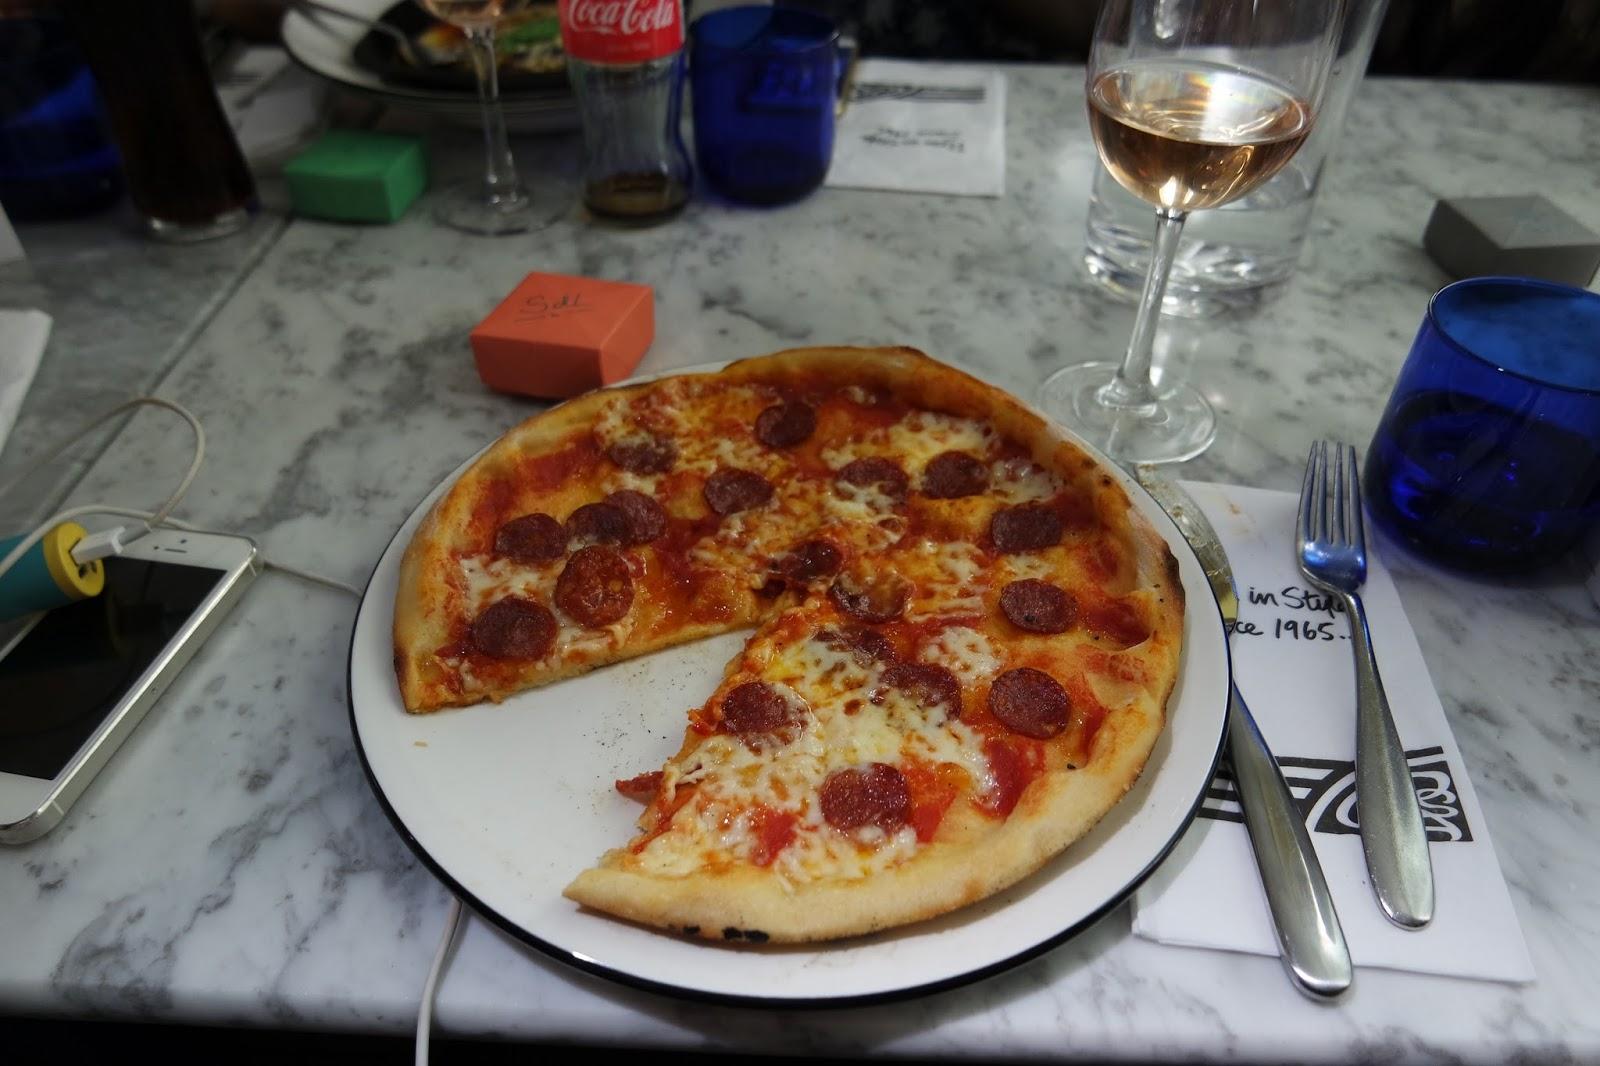 bloggerslunch pizza express s urs de luxe. Black Bedroom Furniture Sets. Home Design Ideas